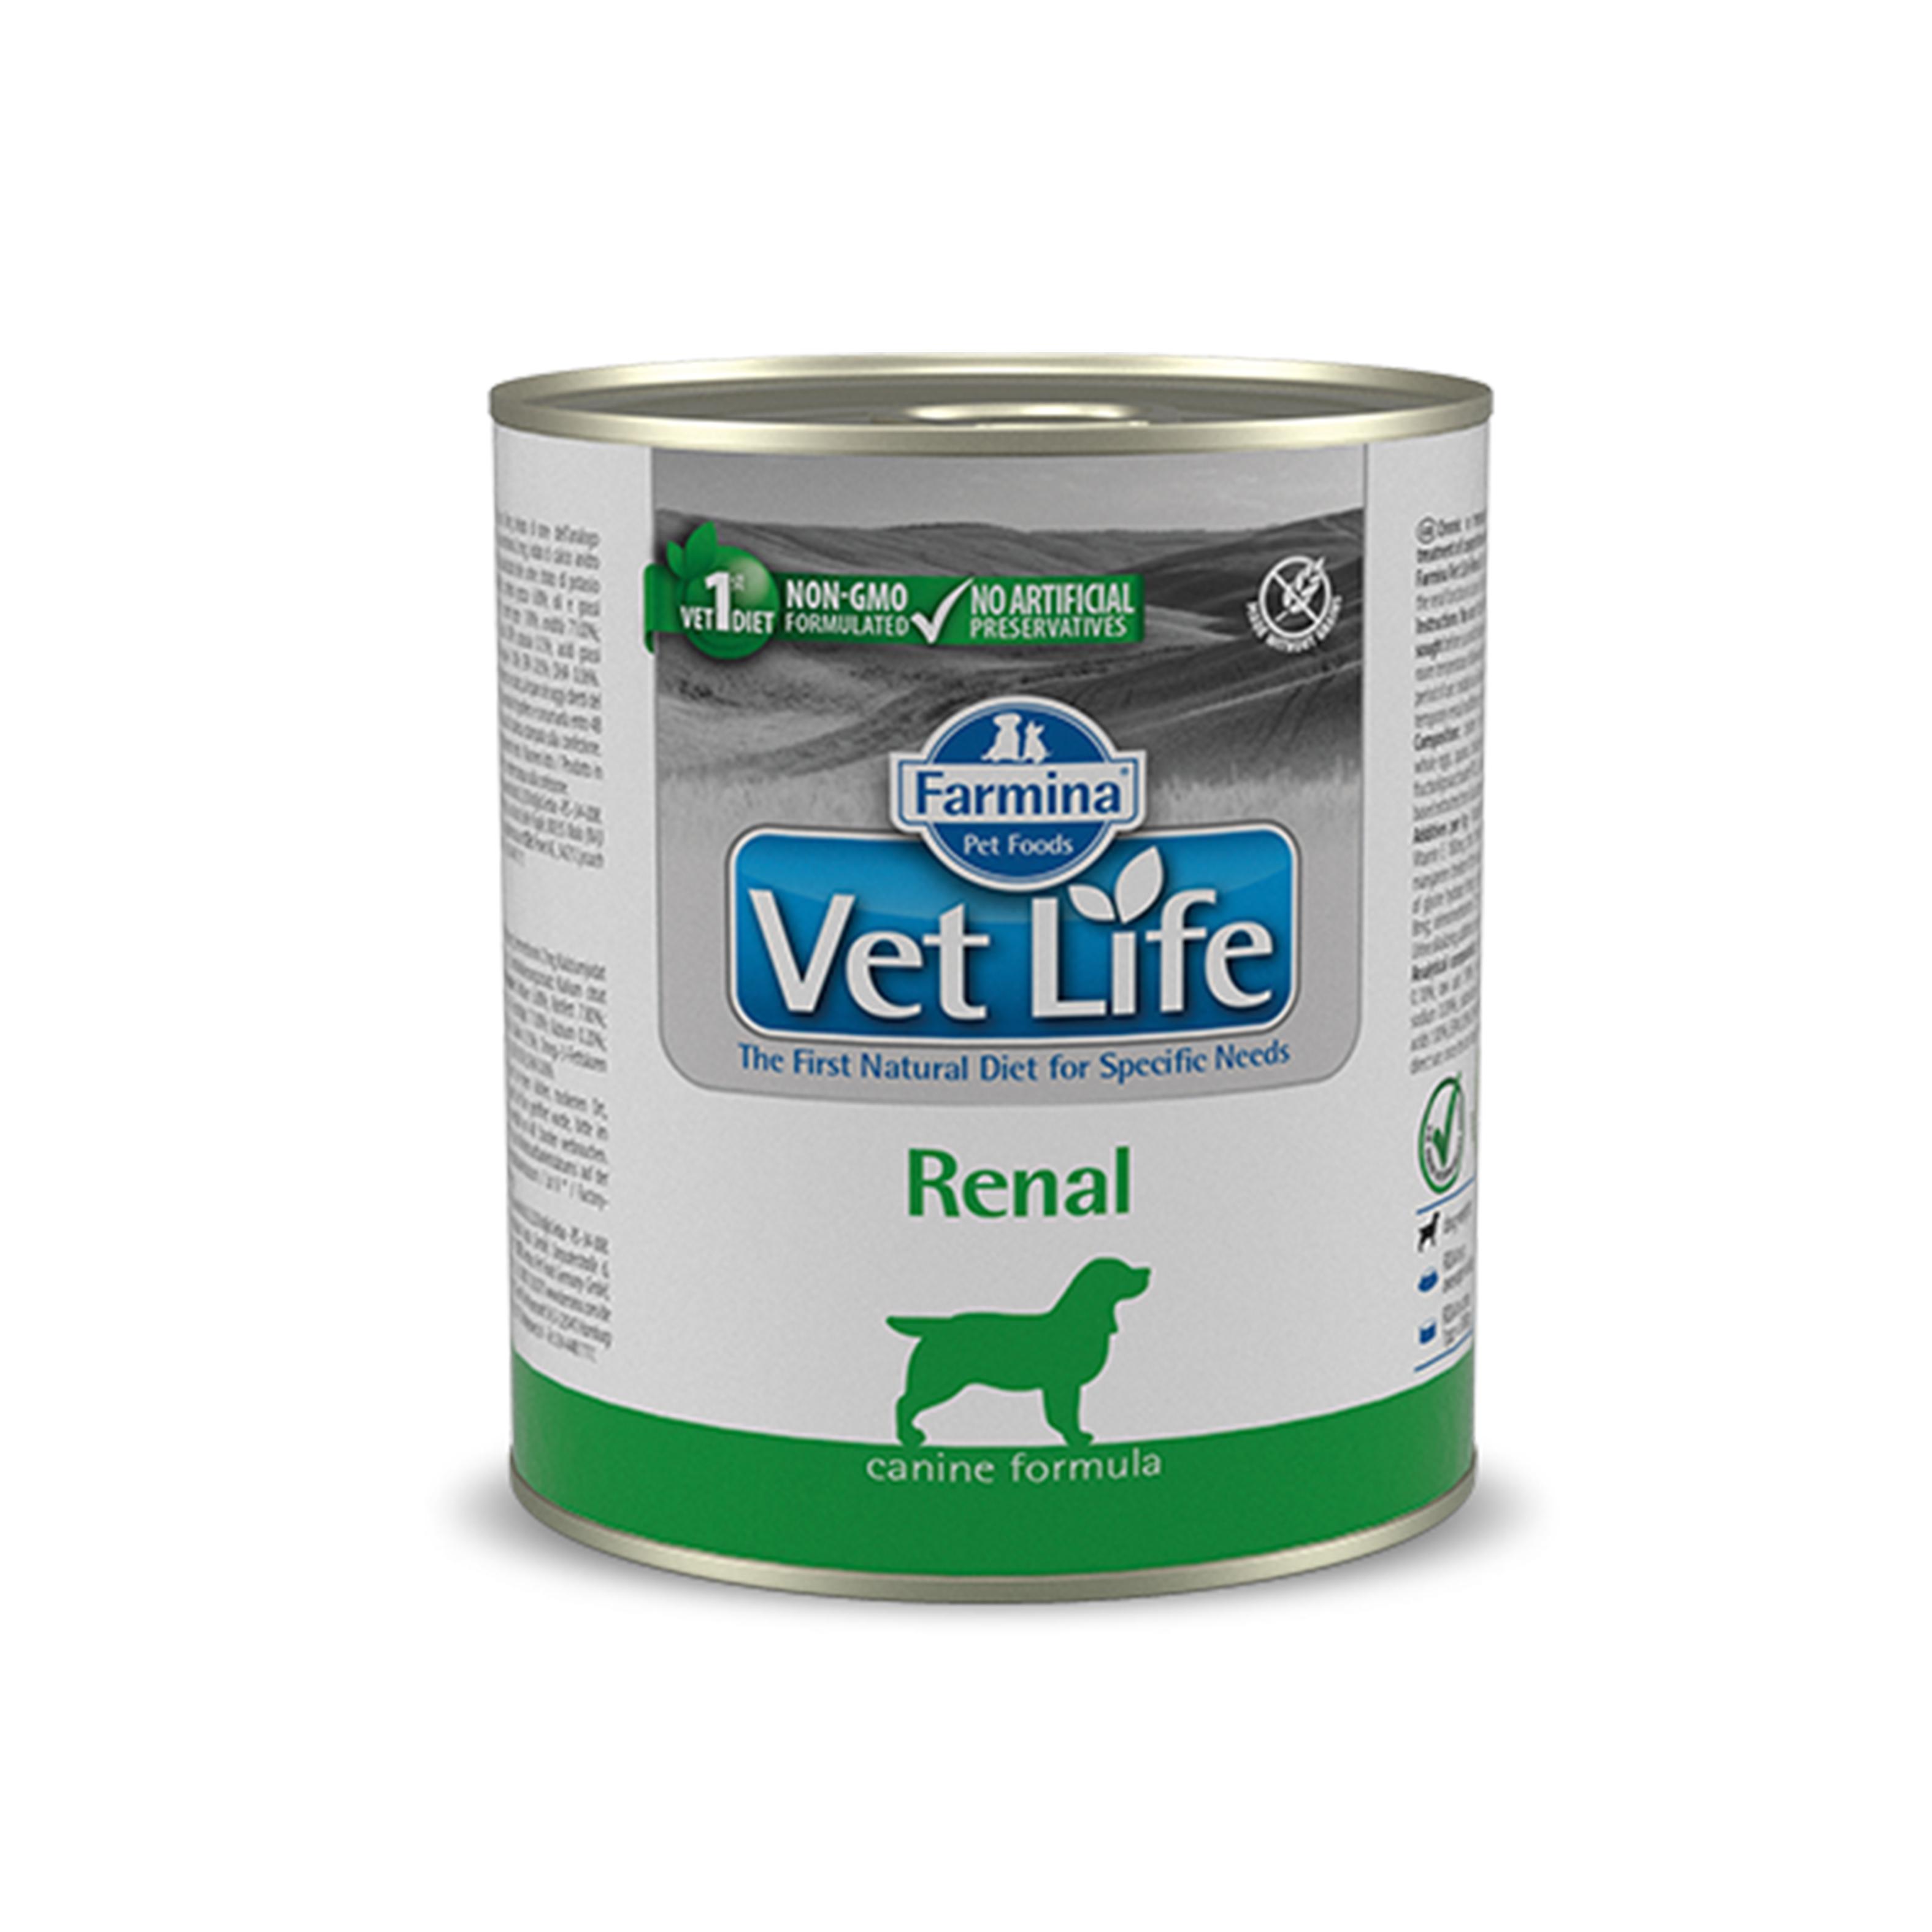 https://d2ac76g66dj6h3.cloudfront.net/media/catalog/product/v/e/vet_life_natural_diet_dog_renal_conserva_300_gr.jpg nou